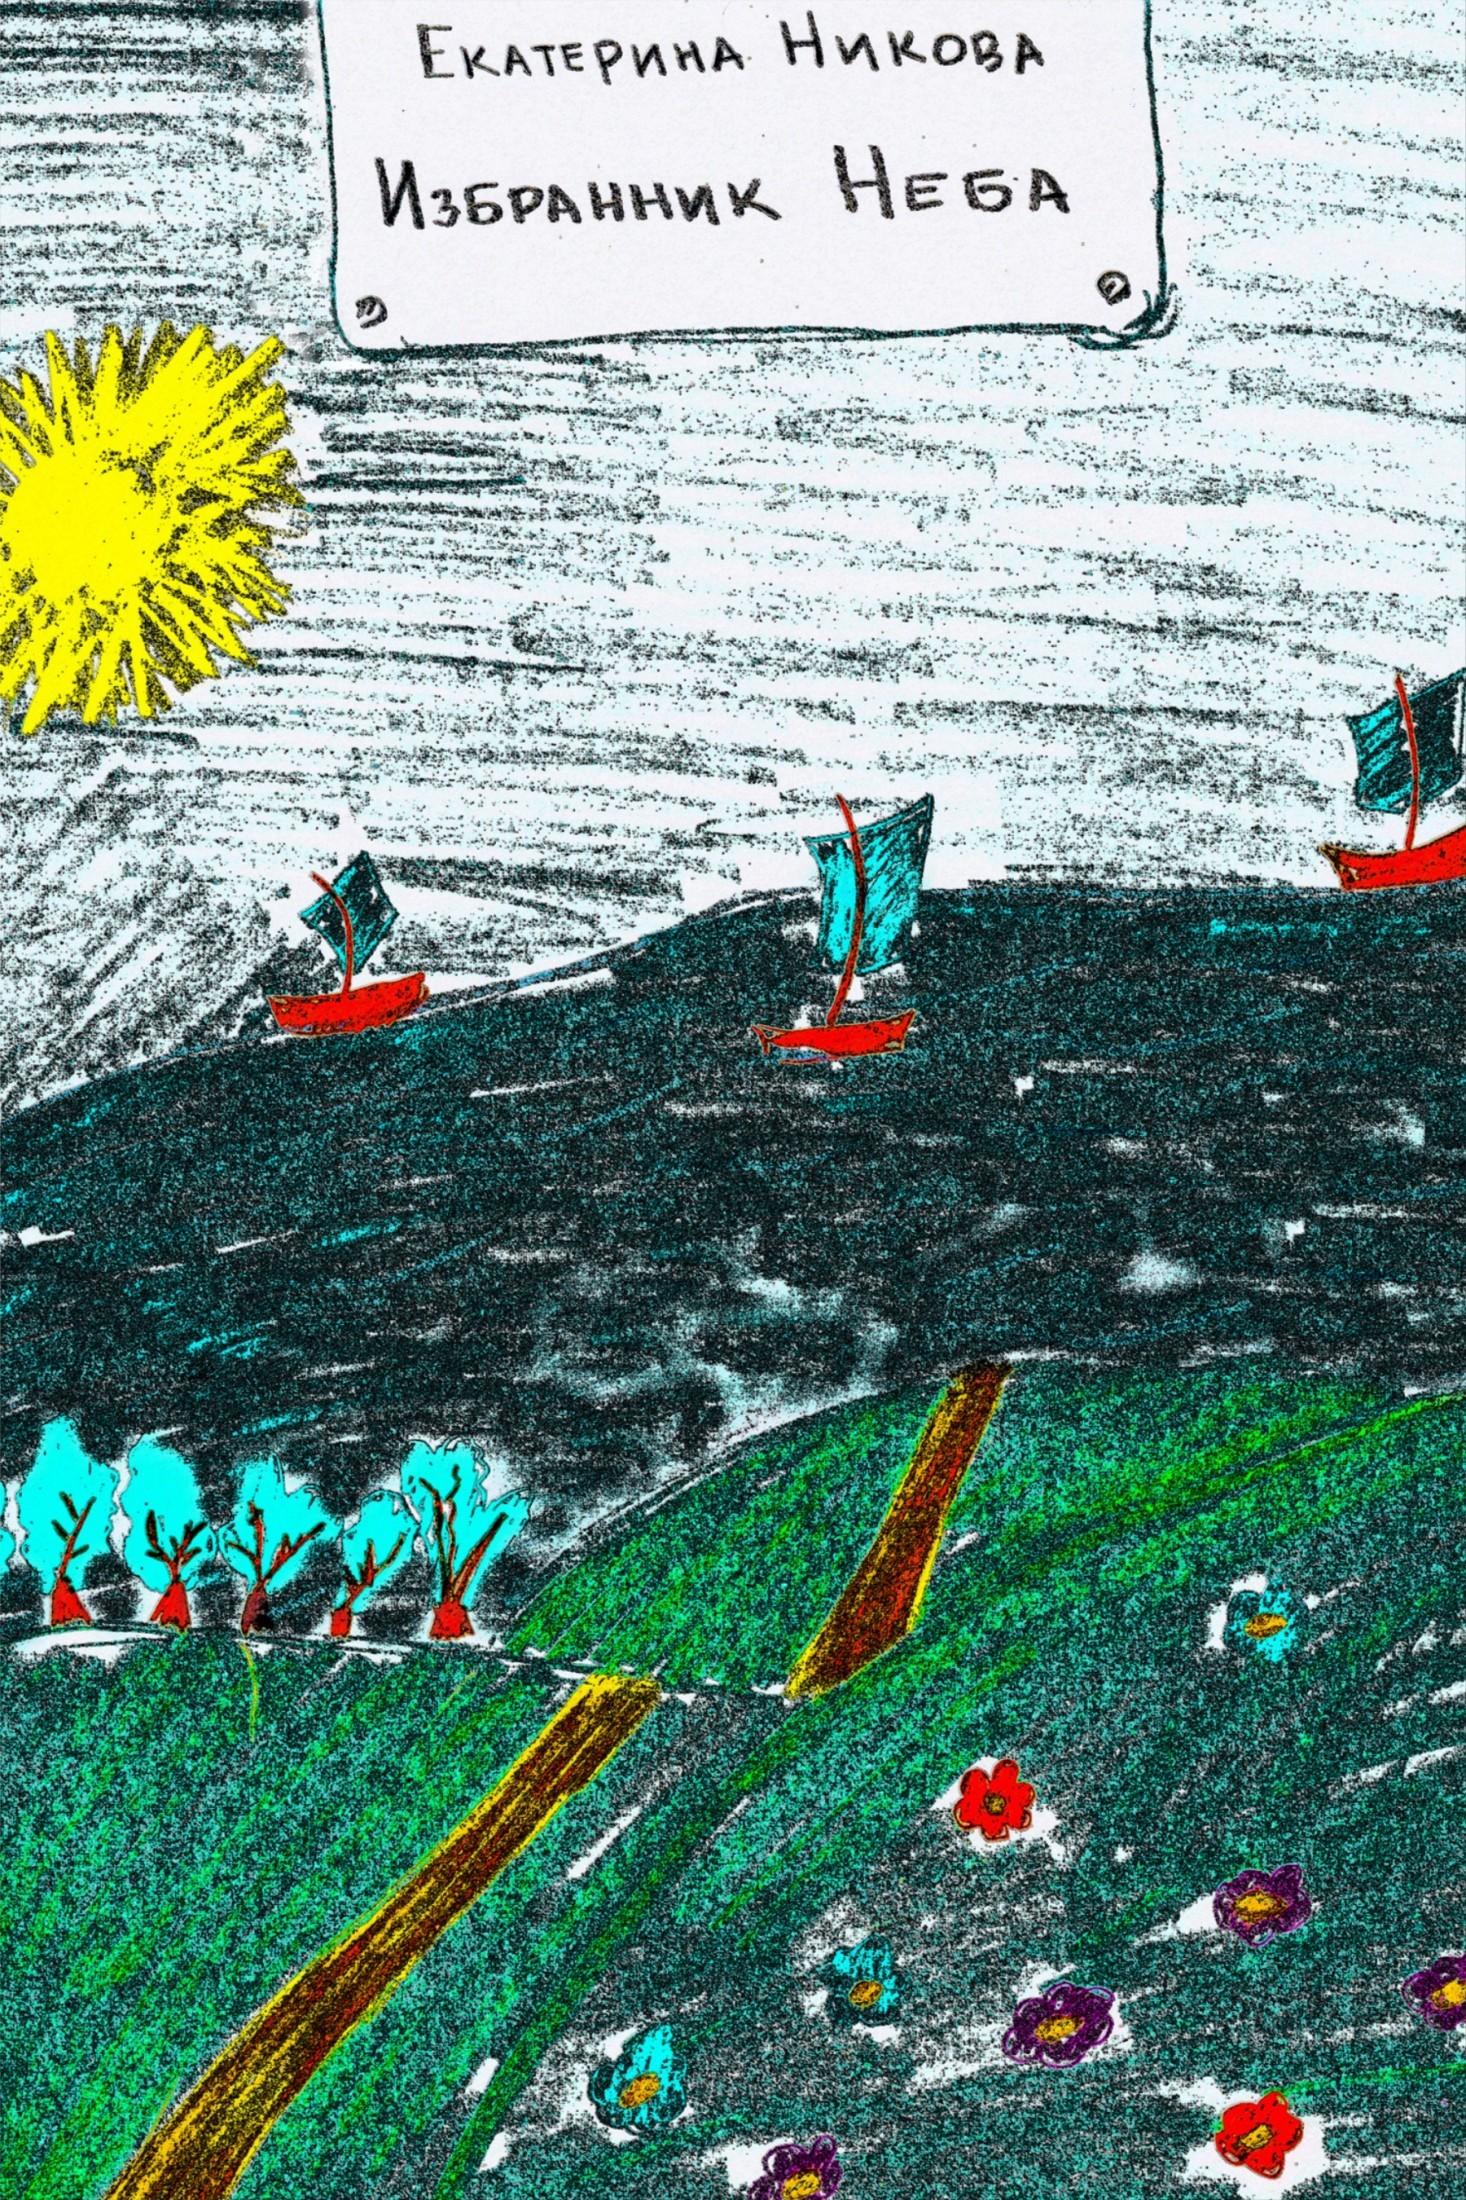 Екатерина Никова Избранник Неба [jamont]polyester women men quick drying summer baseball cap breathable mesh inner snapback hat casual trucker bone casquette